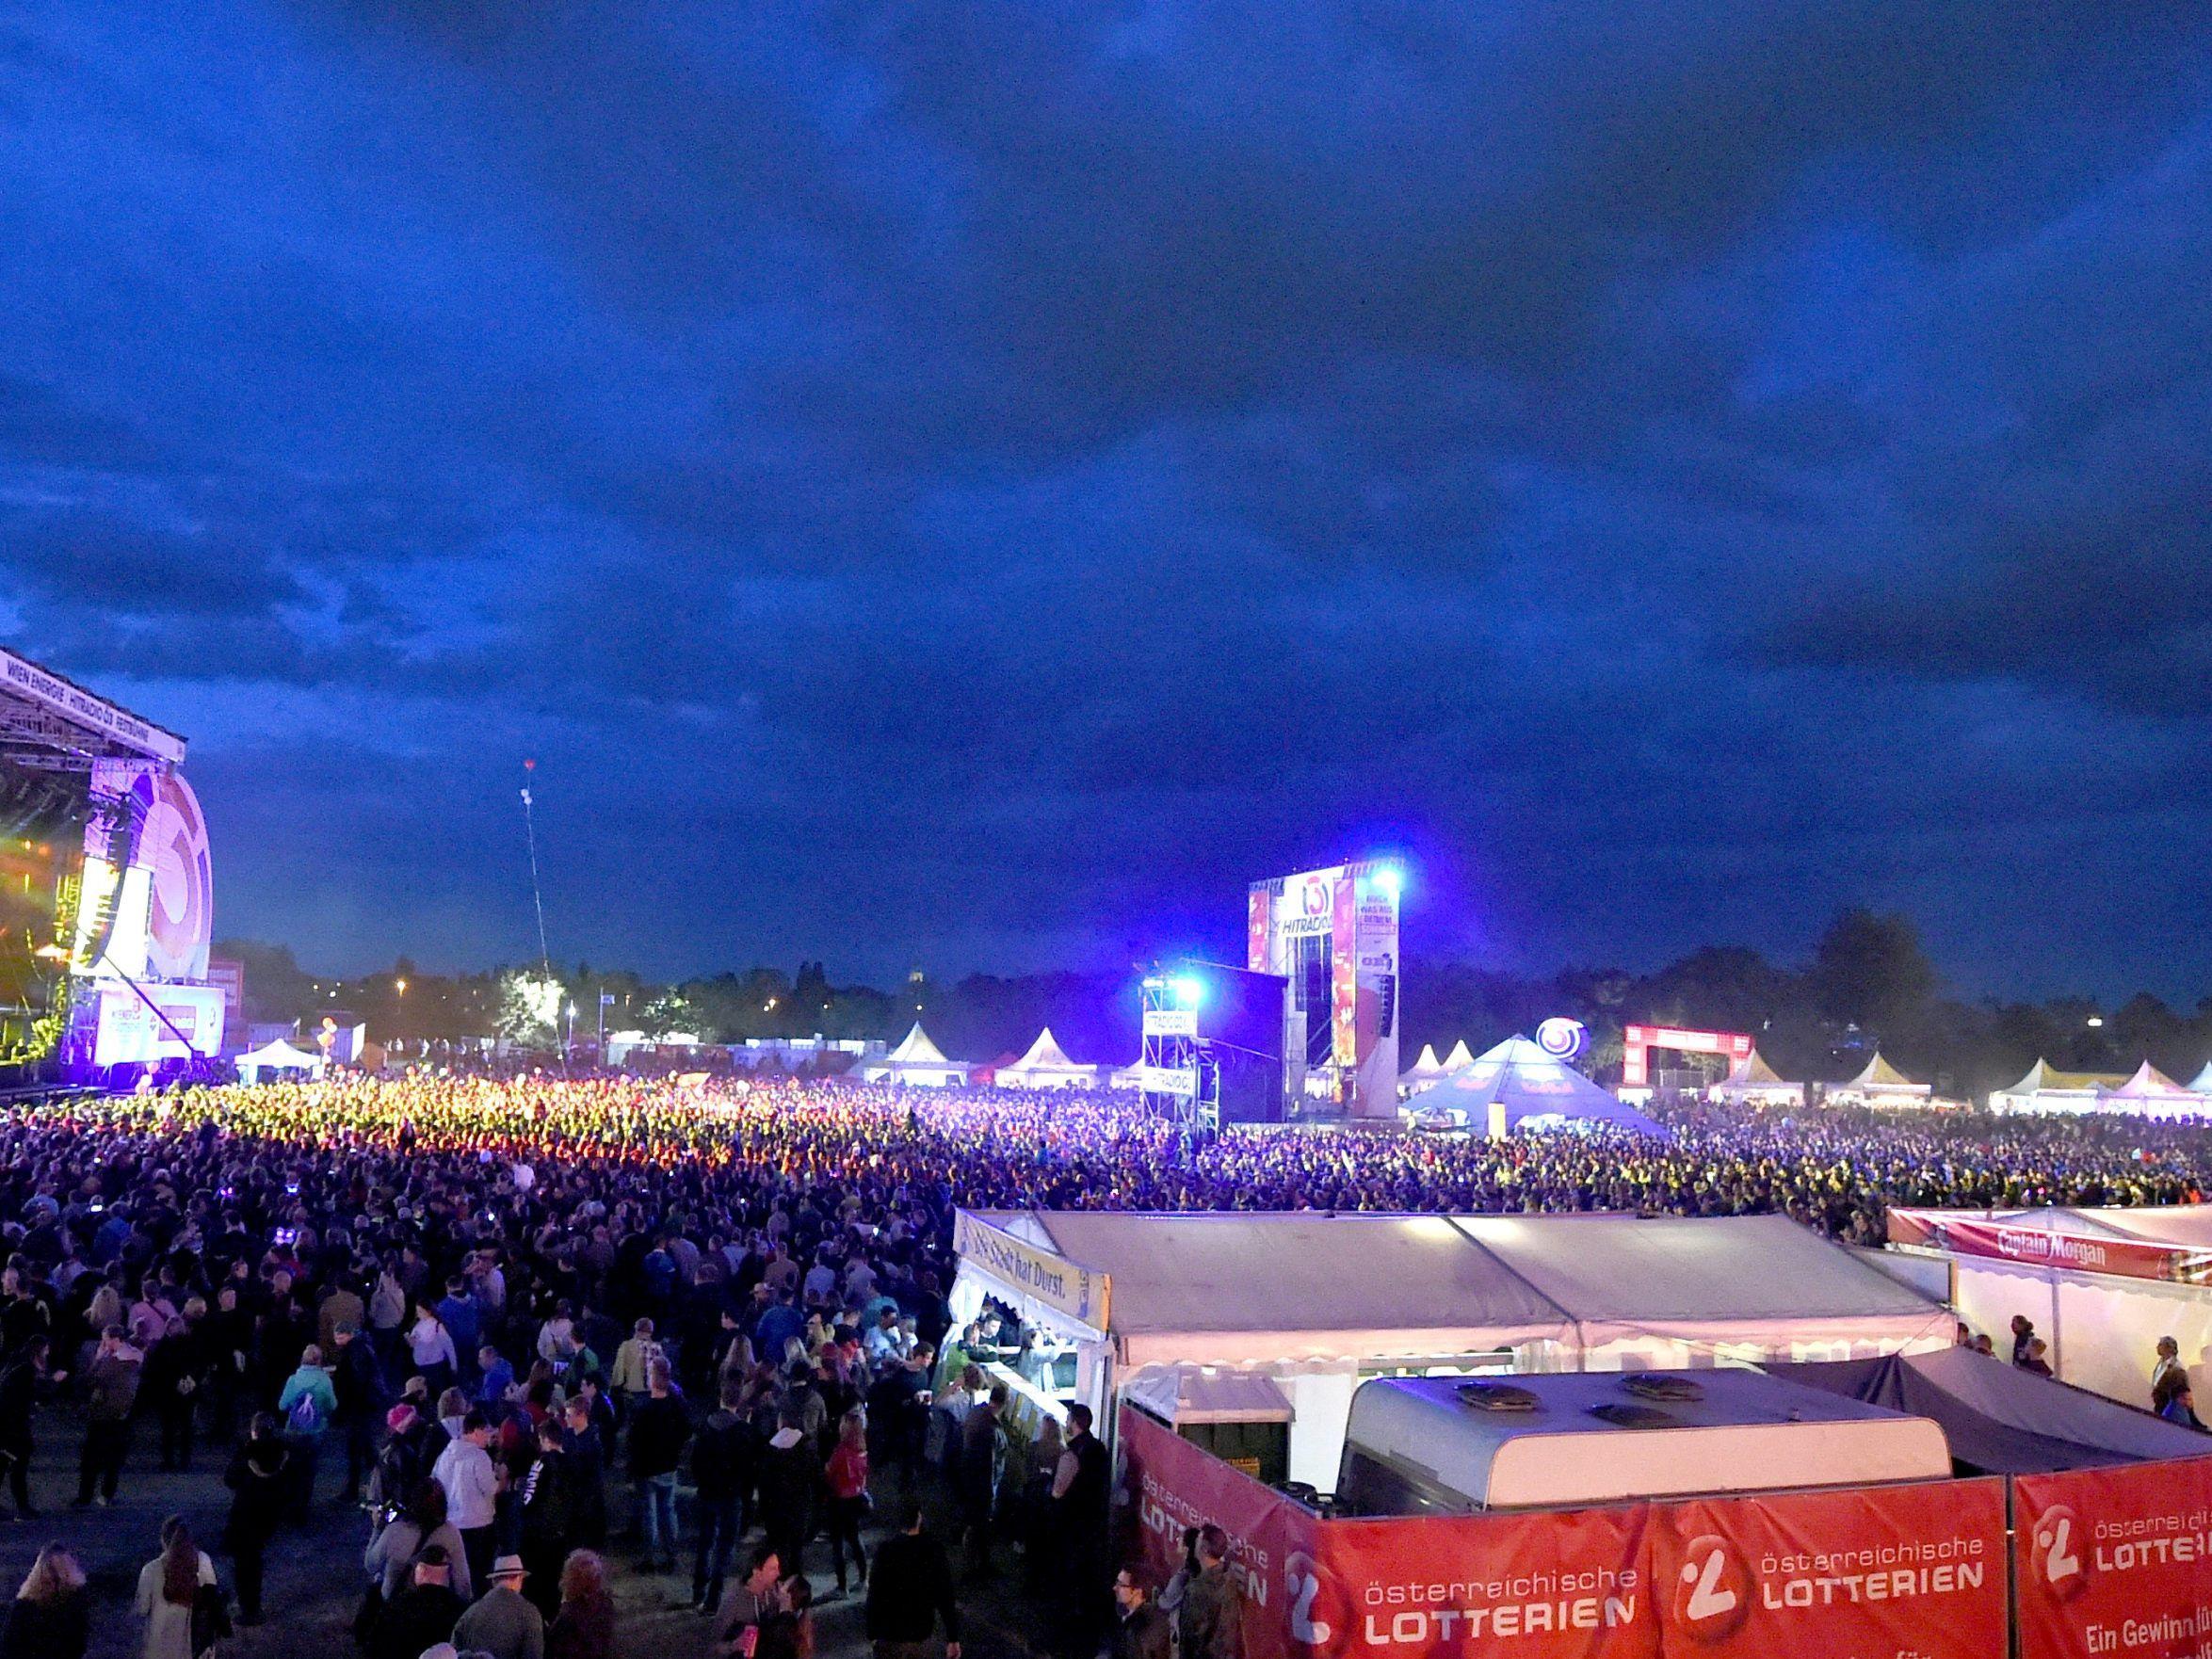 Donauinselfest 2019